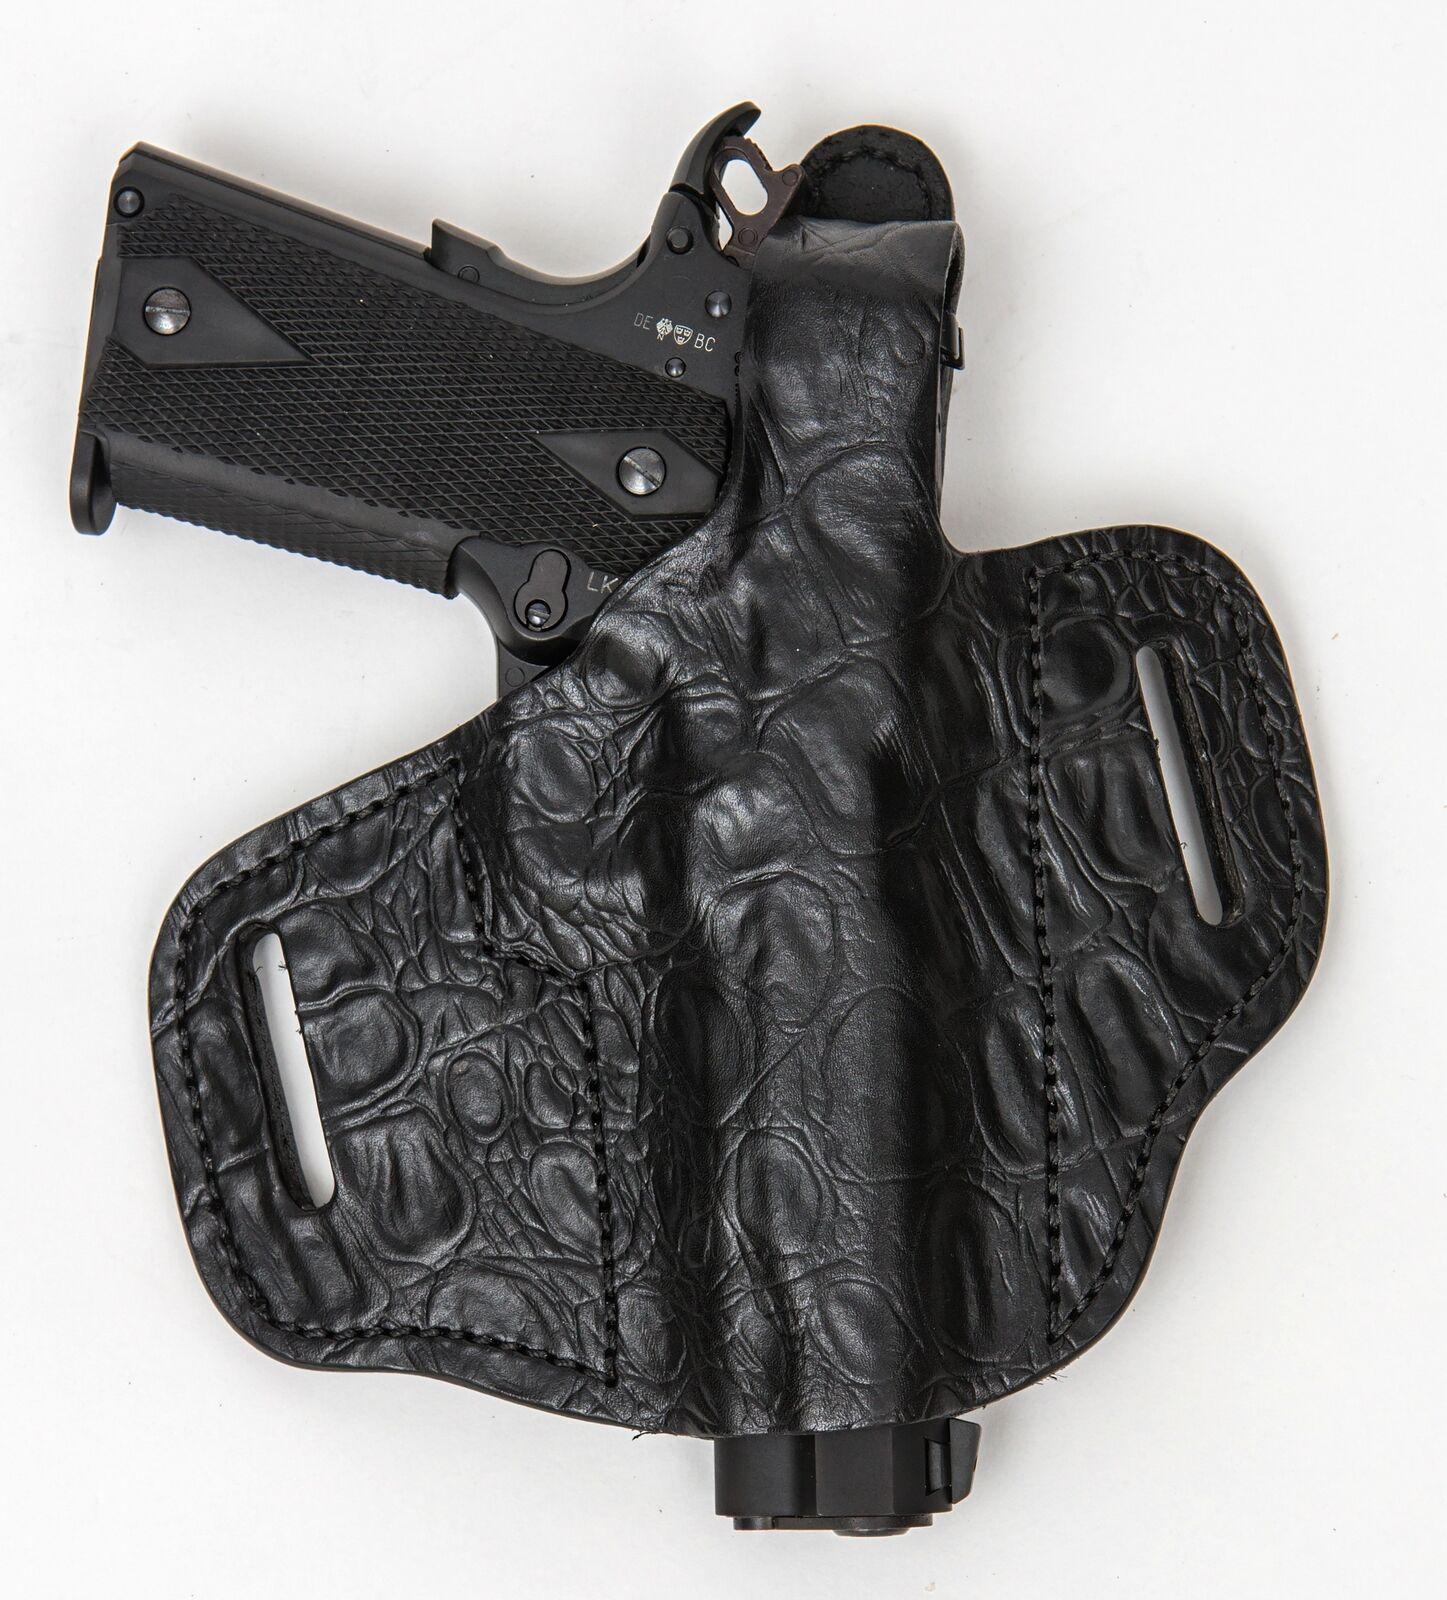 On Duty Conceal RH LH OWB Leder Gun Holster For Kel Tec PF9 w/ CT Laserguard